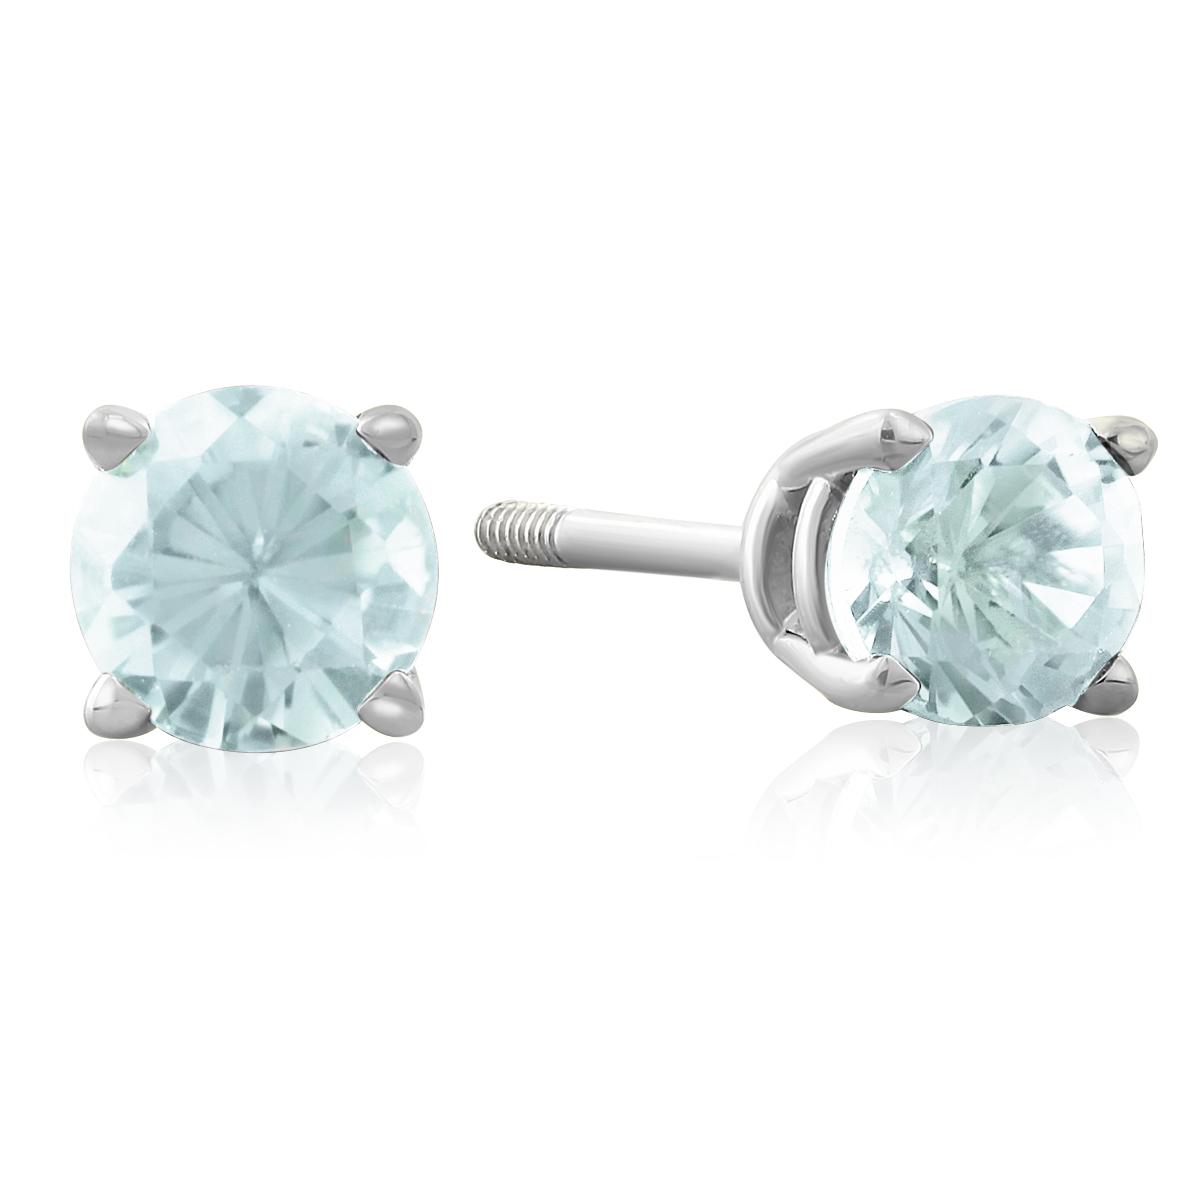 1 2 Carat Blue Topaz Stud Earrings in 14k White Gold